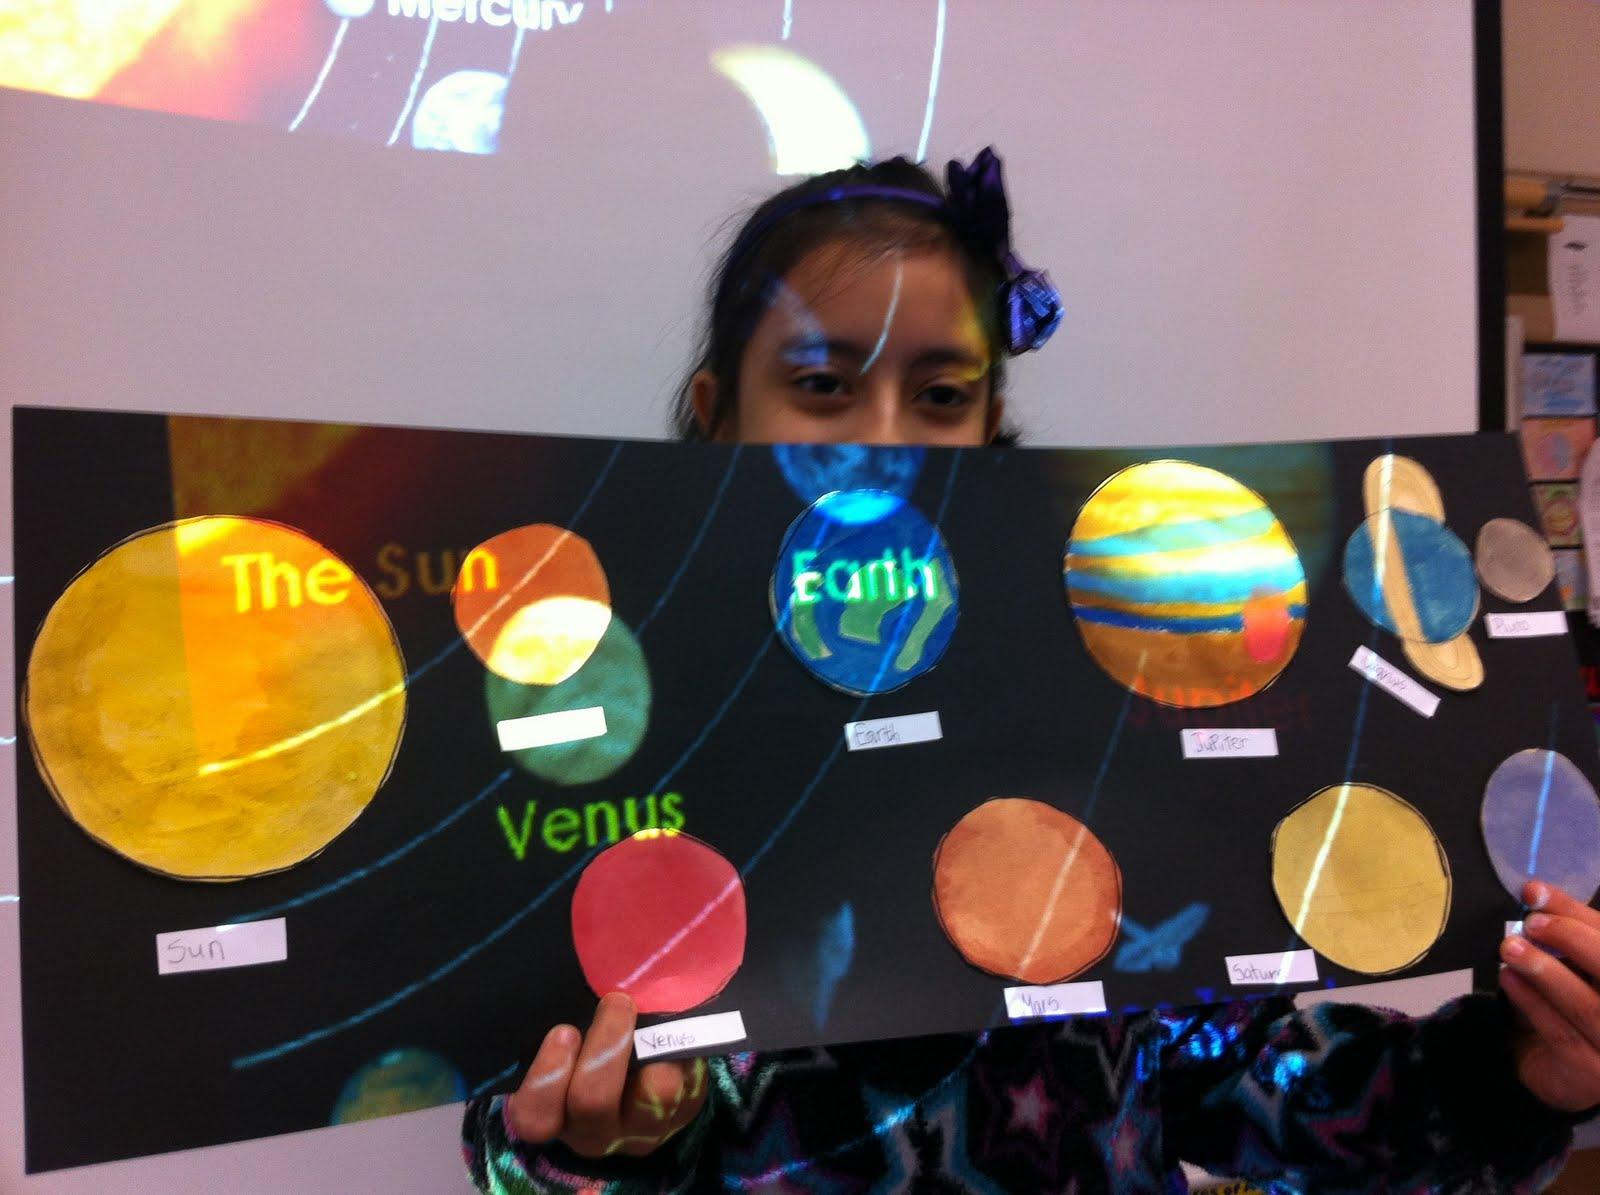 Solar System WebQuest 3rd Grade - Pics about space